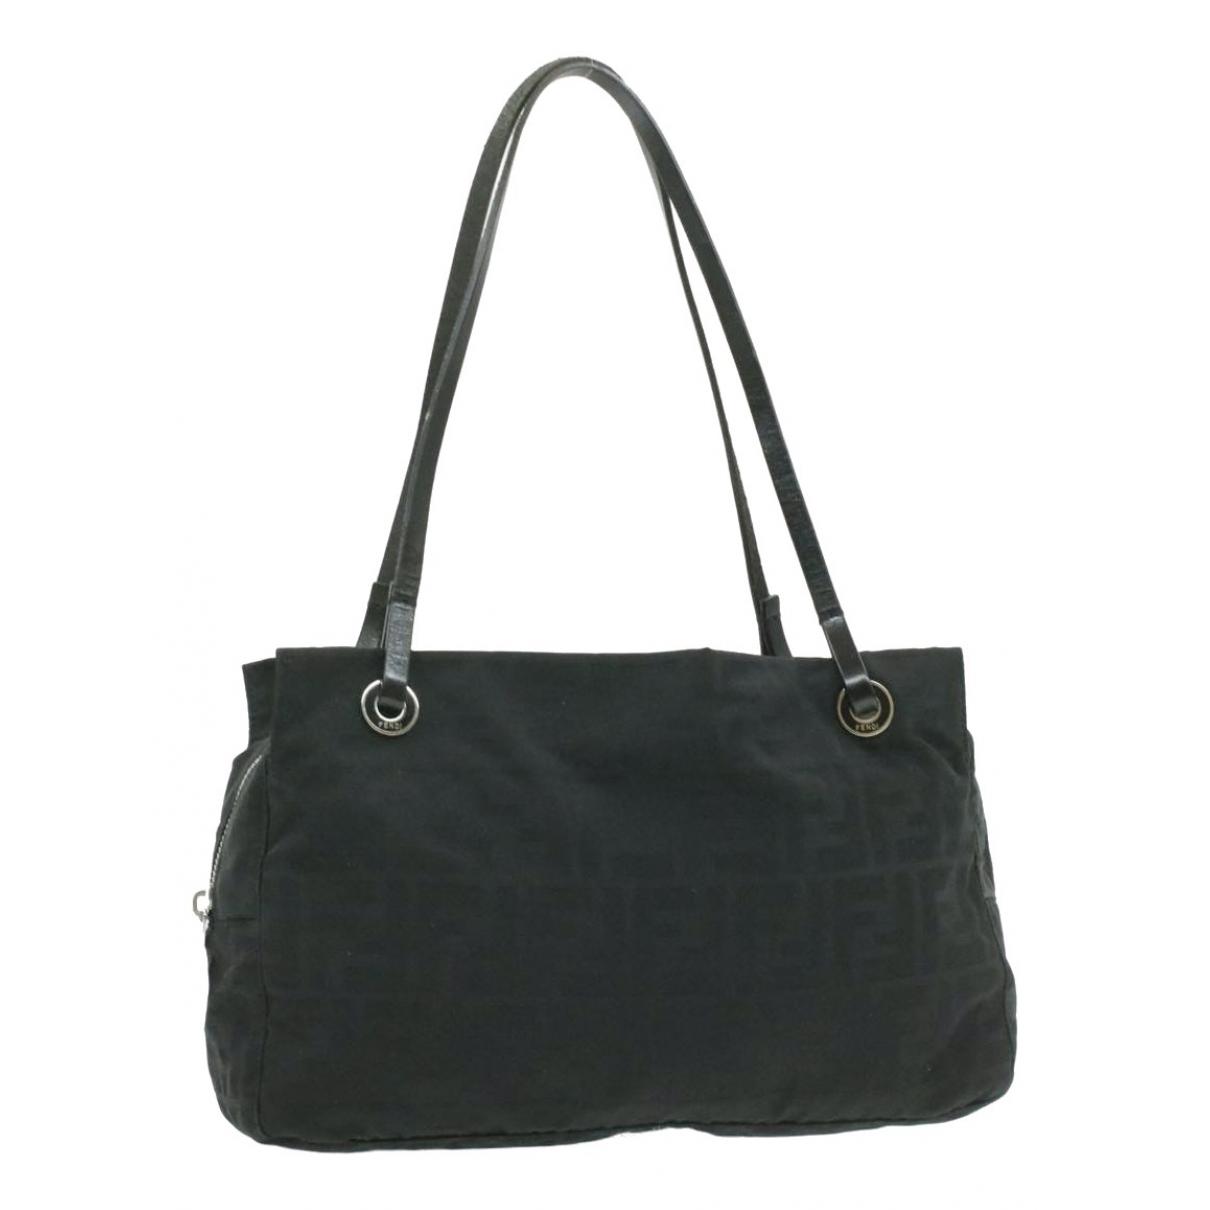 Fendi \N Handtasche in  Schwarz Synthetik